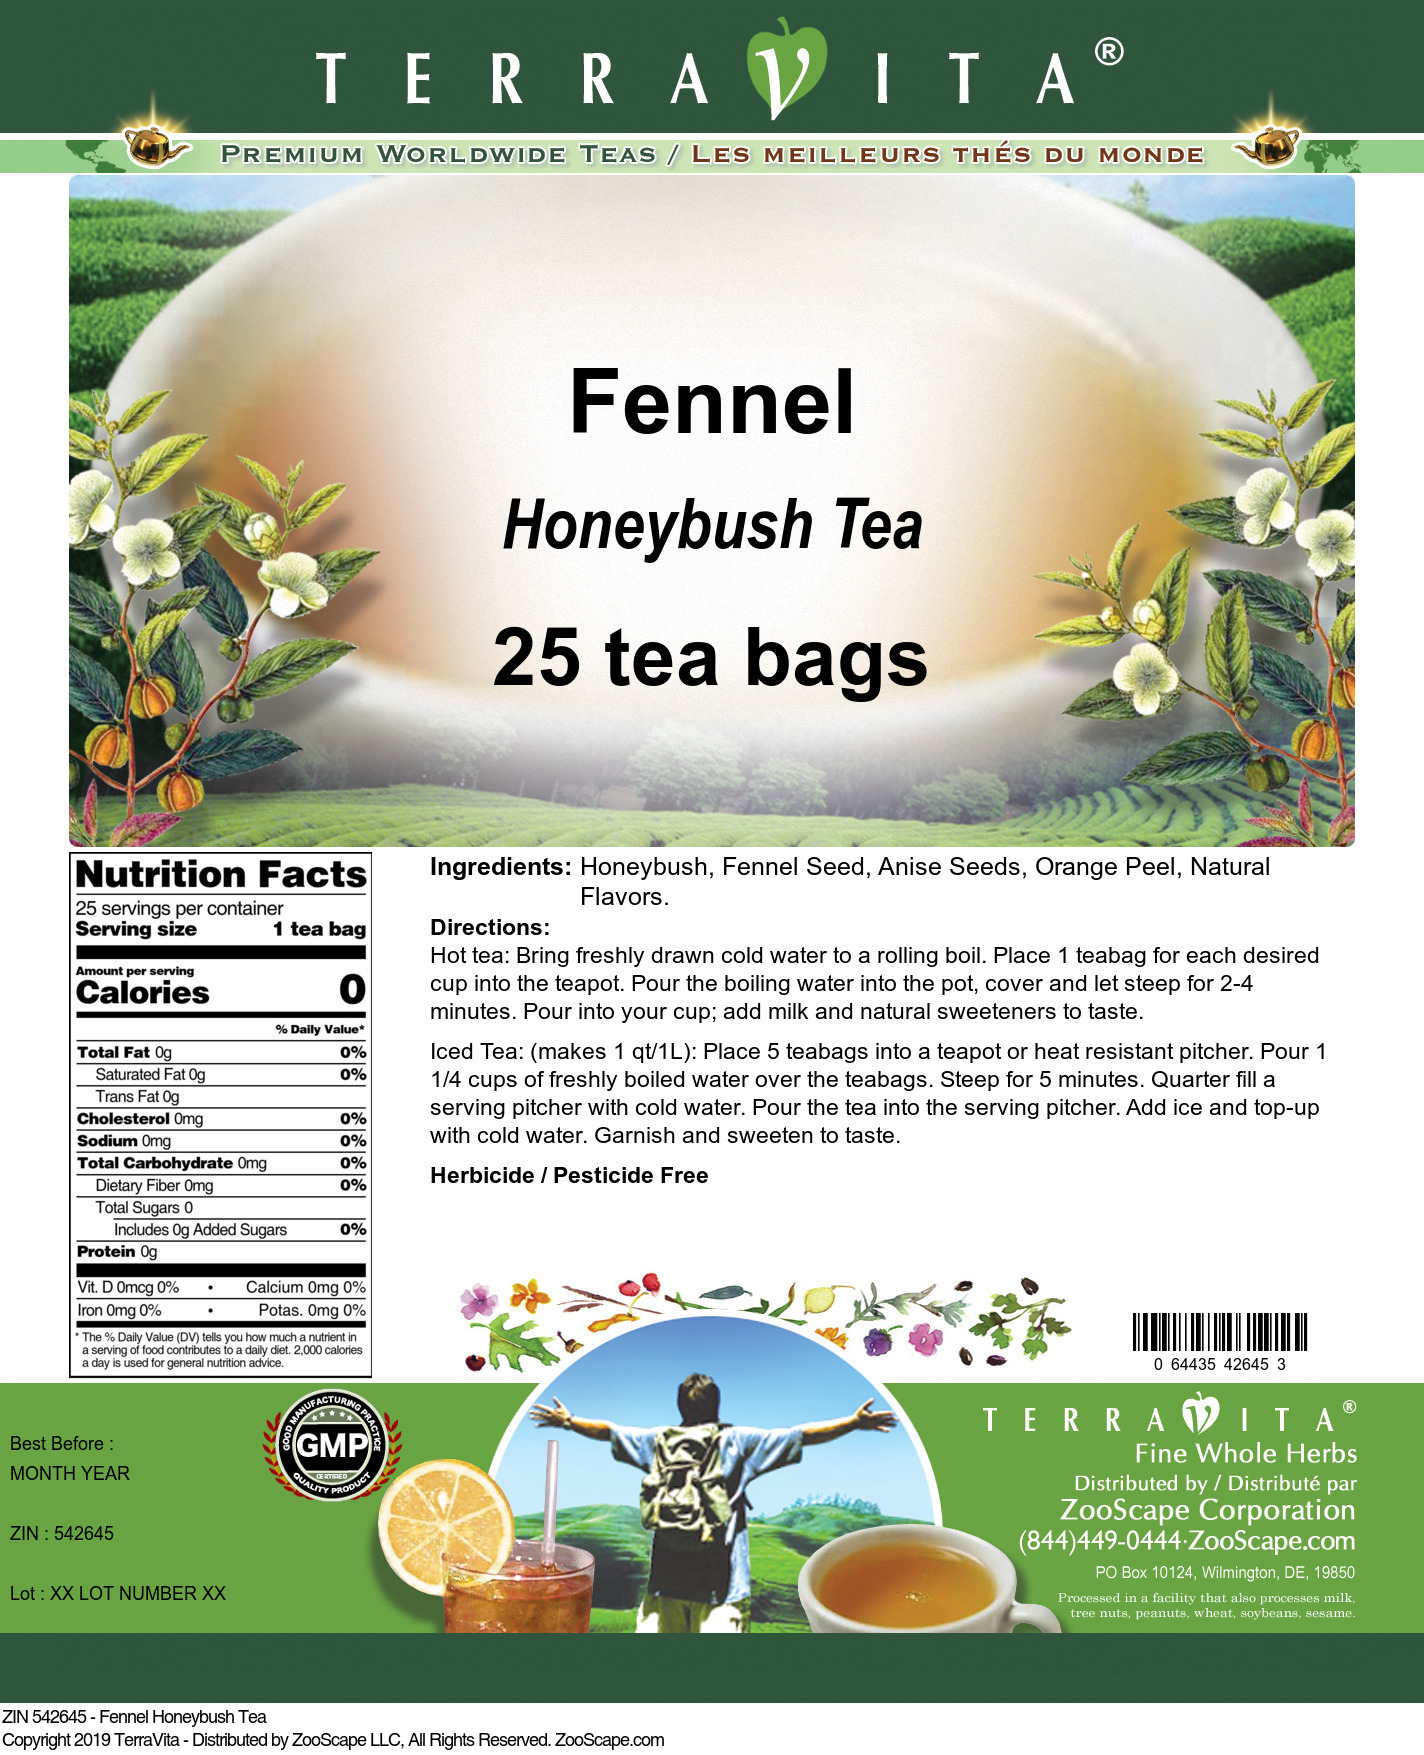 Fennel Honeybush Tea